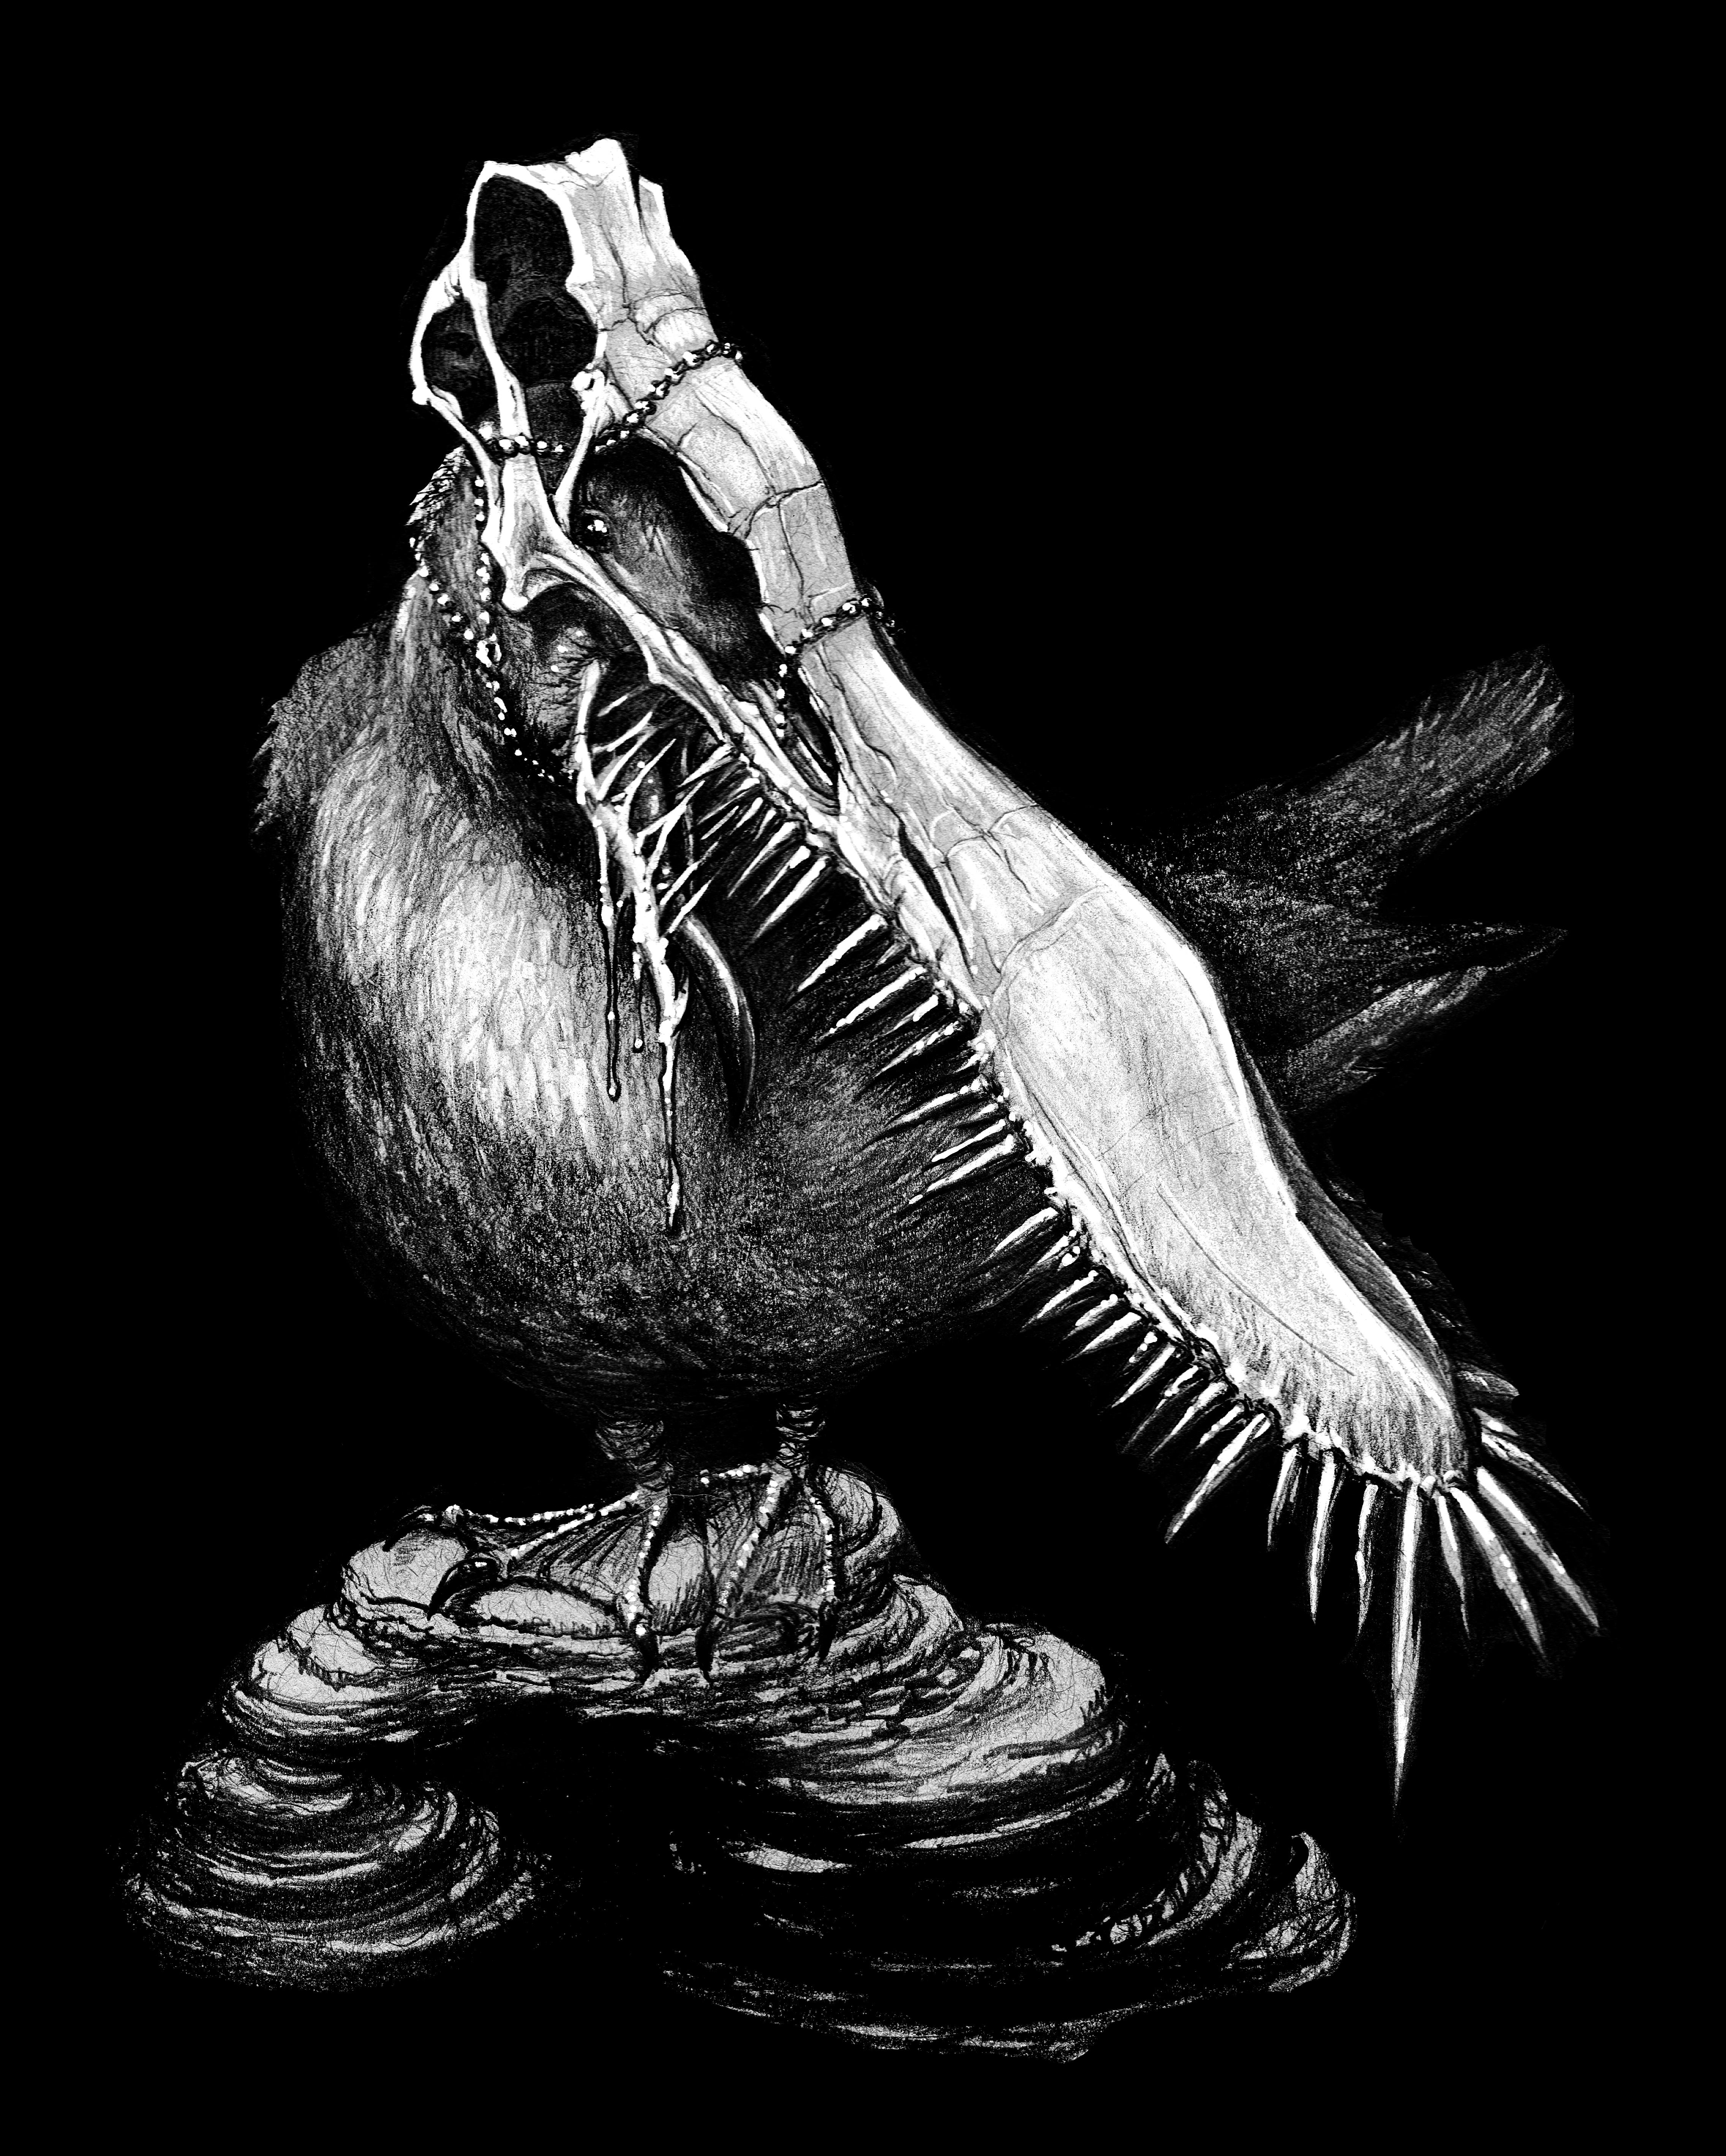 California Gull/Pterosaur